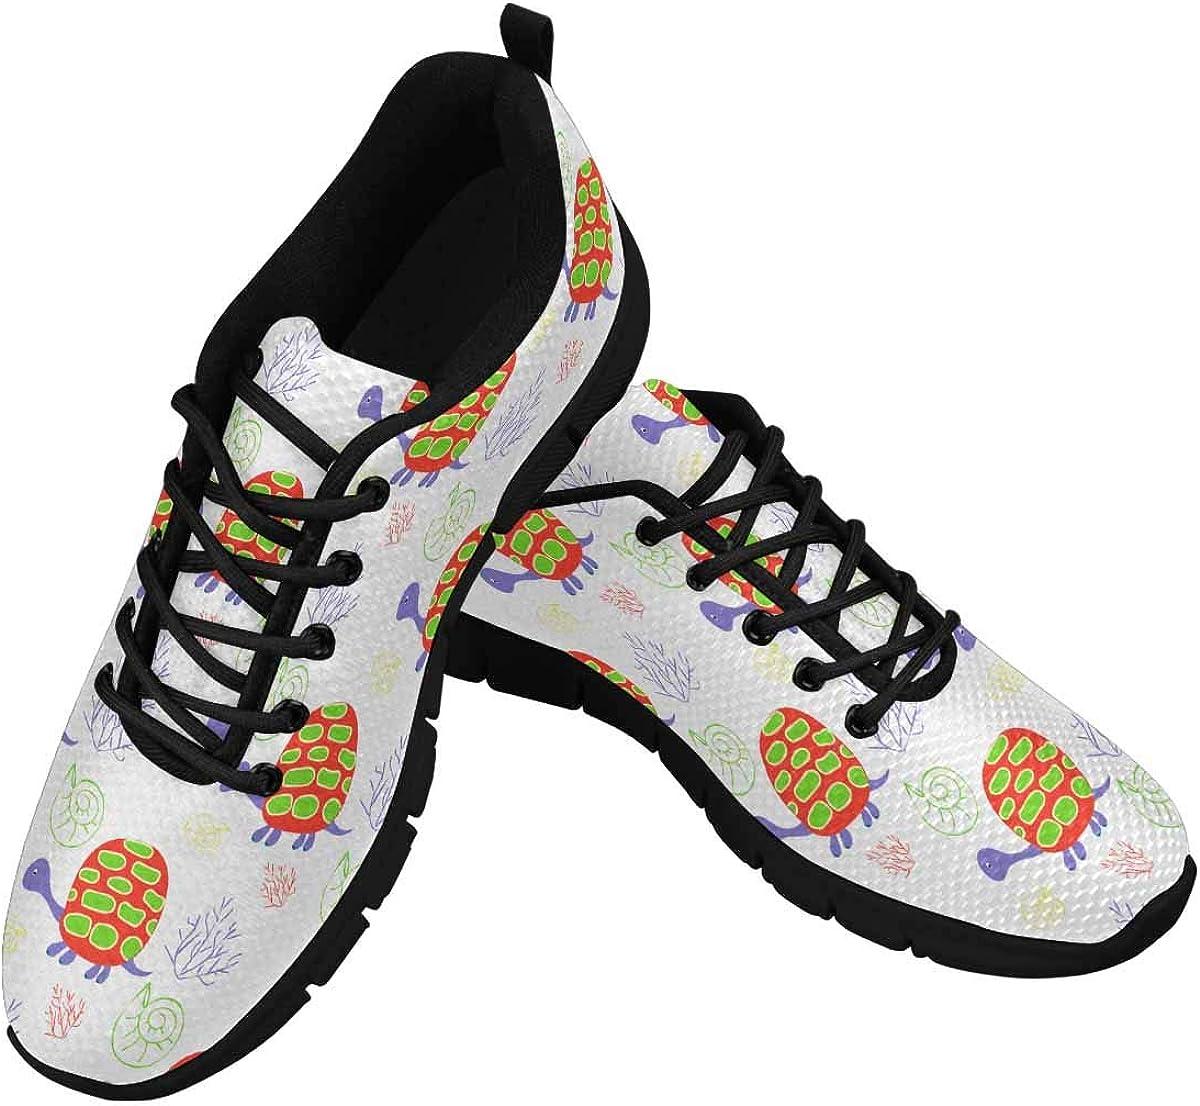 INTERESTPRINT Turtles Pattern Women's Lightweight Sneakers Mesh Breathable Yoga Shoes